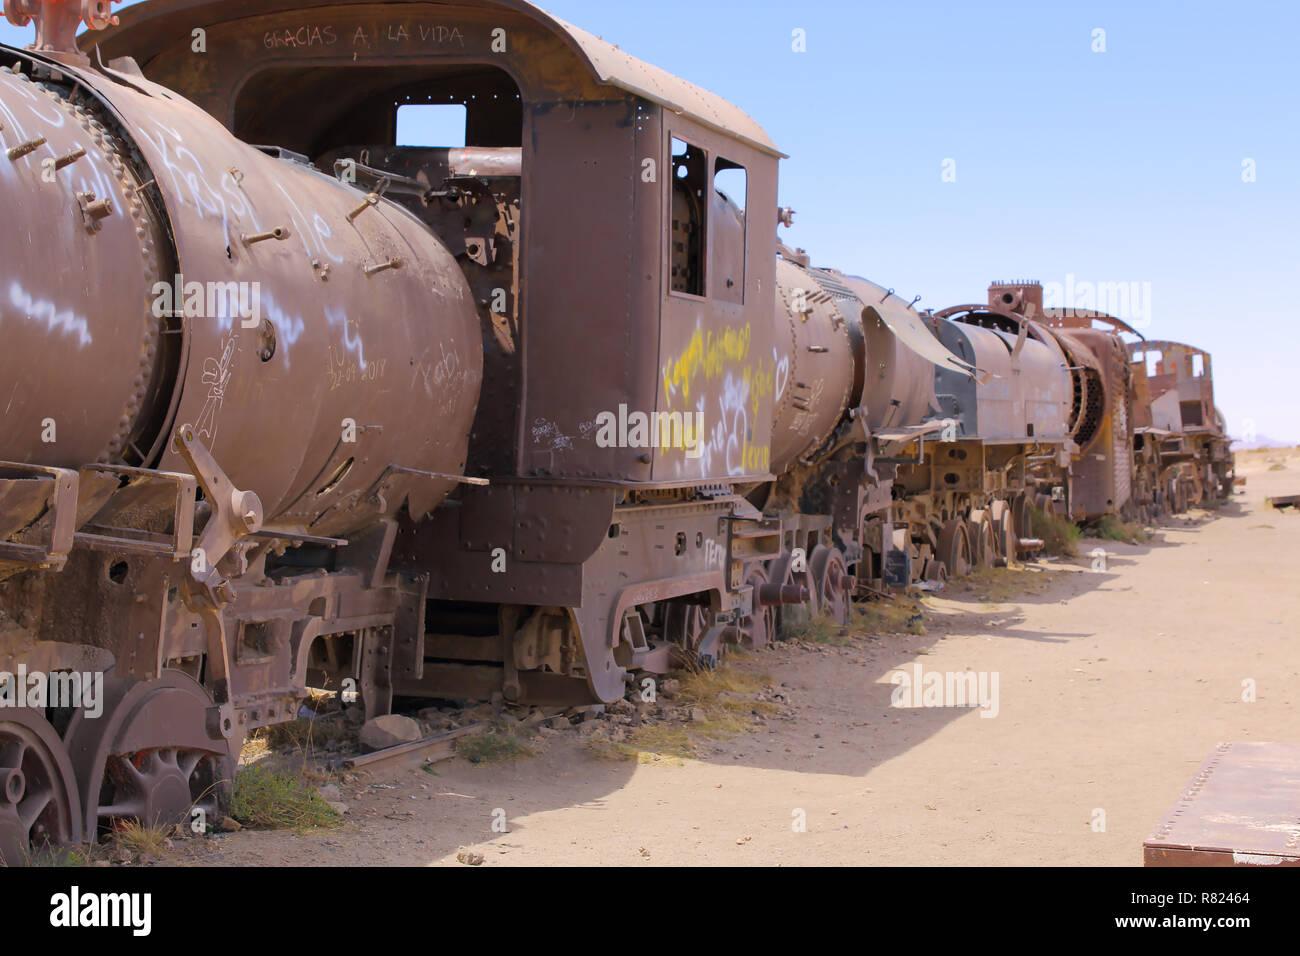 Rusty old steam train in the Train Cemetery, in Uyuni, Bolivia near the salt flats Stock Photo